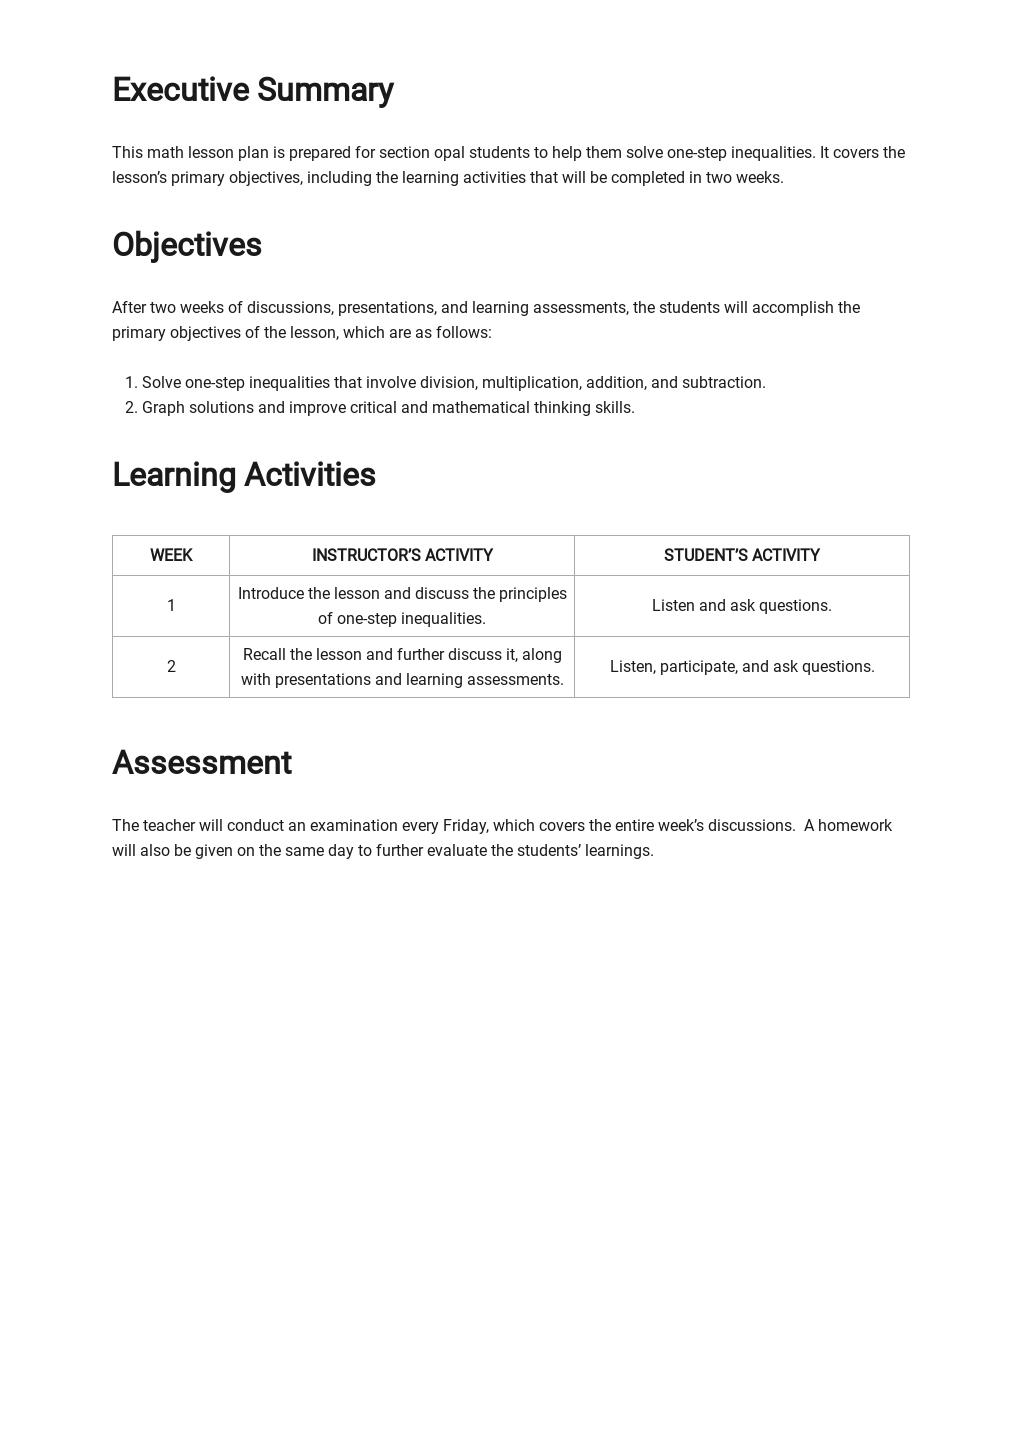 Secondary Math Lesson Plan Template 1.jpe